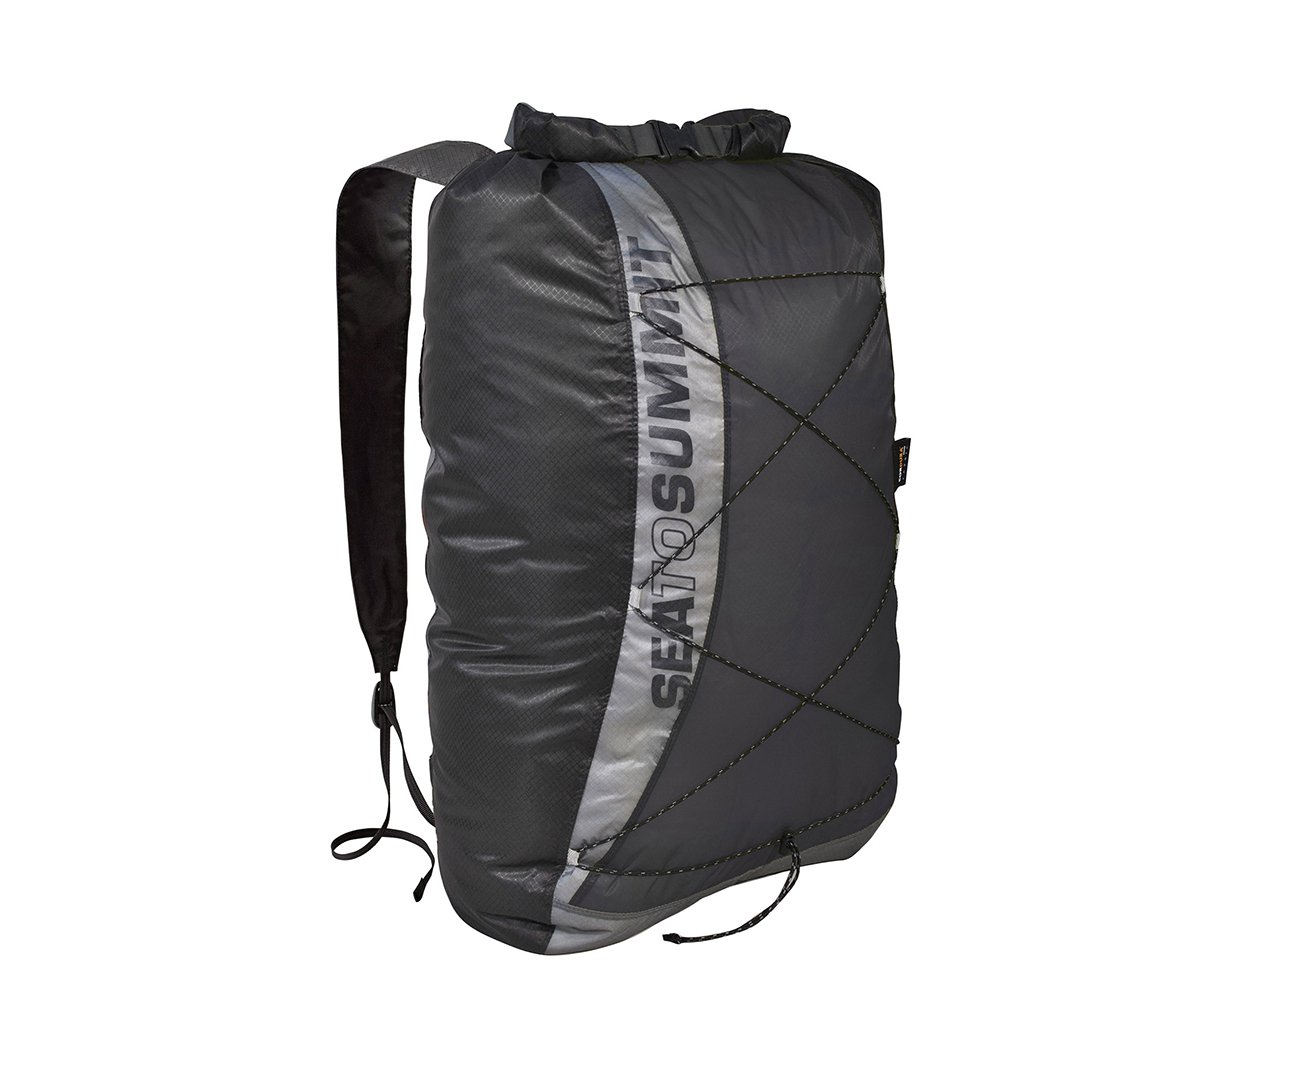 Mochila Sprint Waterproof Drypack 20 Litros Preto - Sea To Summit